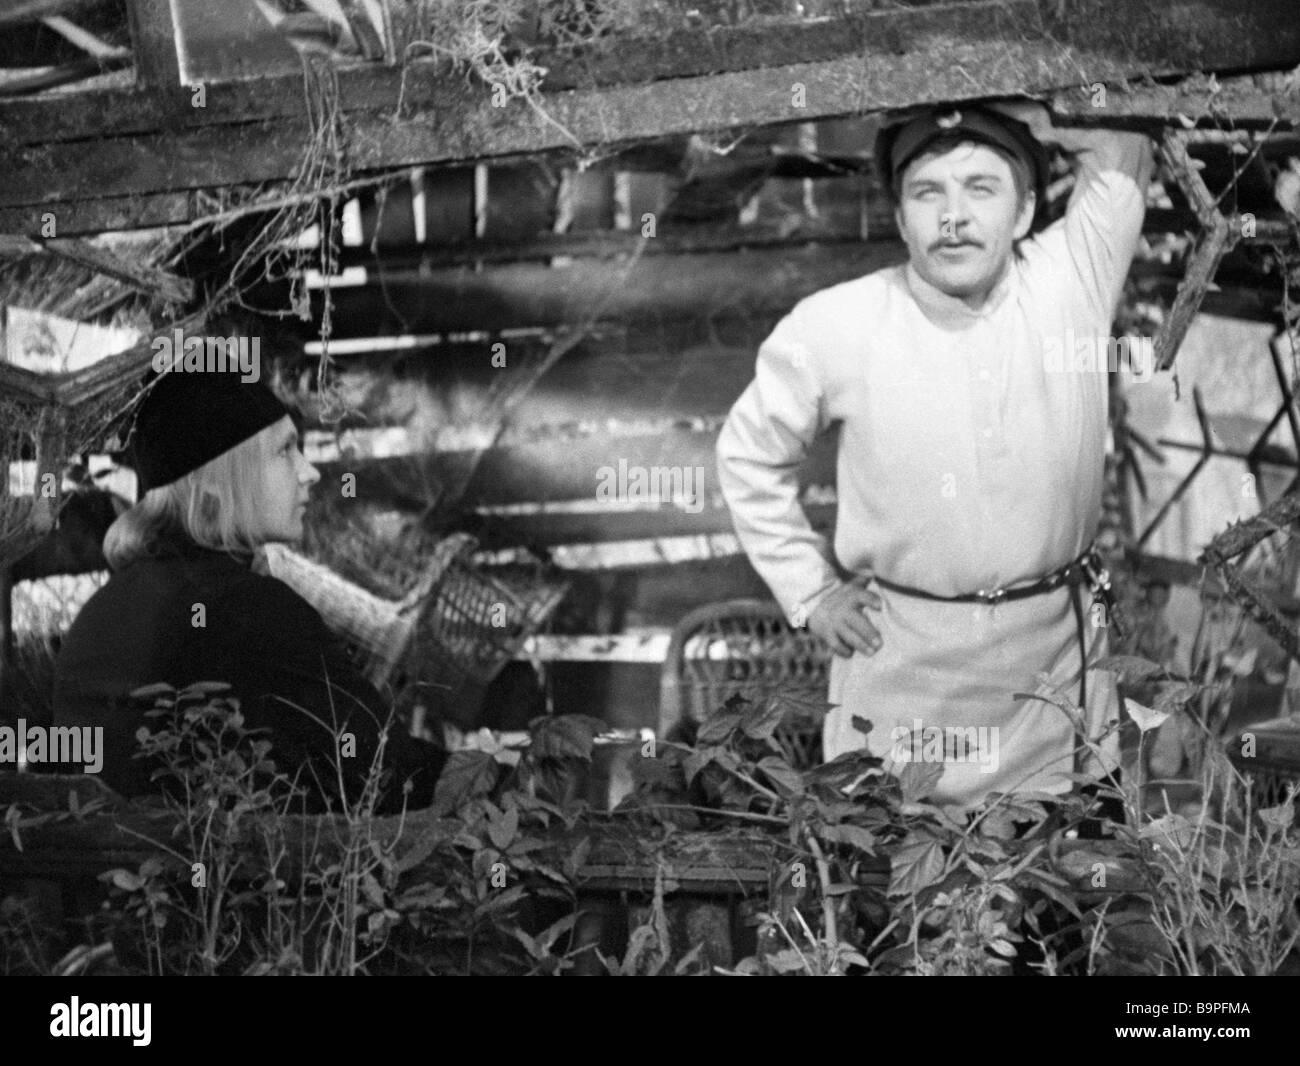 Actor Andrei Myagkov as Alexei Karamazov left and Mikhail Ulyanov as Dmitry Karamazov right in film The Brothers - Stock Image